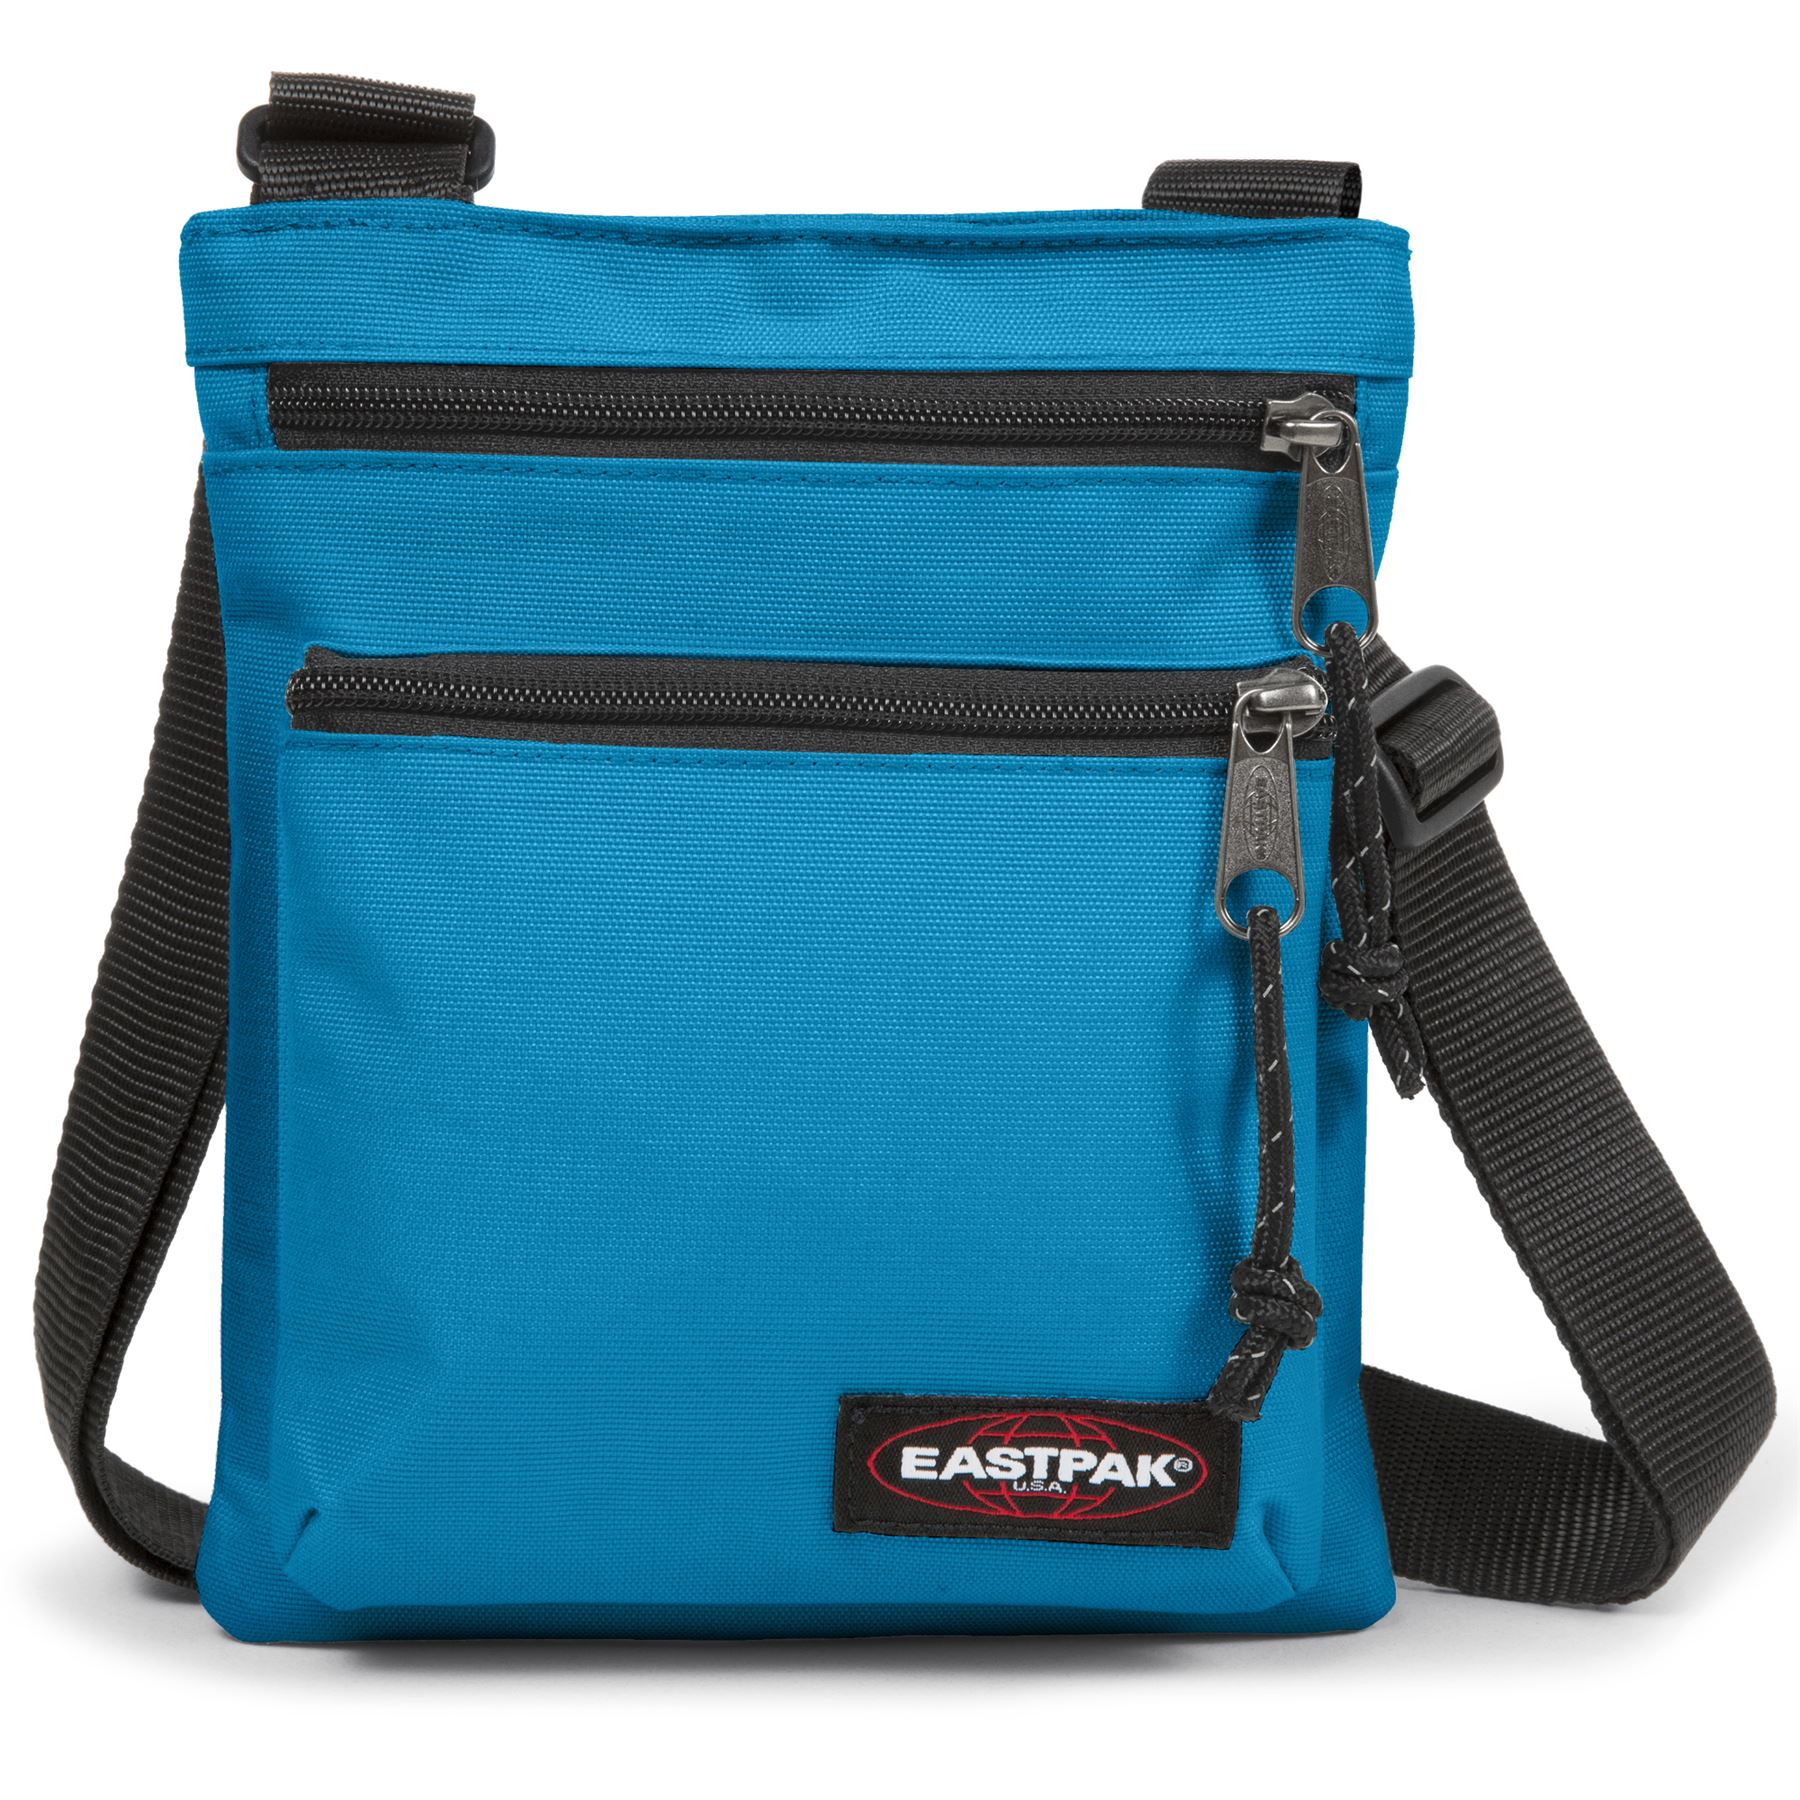 c1e10f782daa Eastpak Rusher Unisex Shoulder Bag ideal Day   Beach   Festival ...